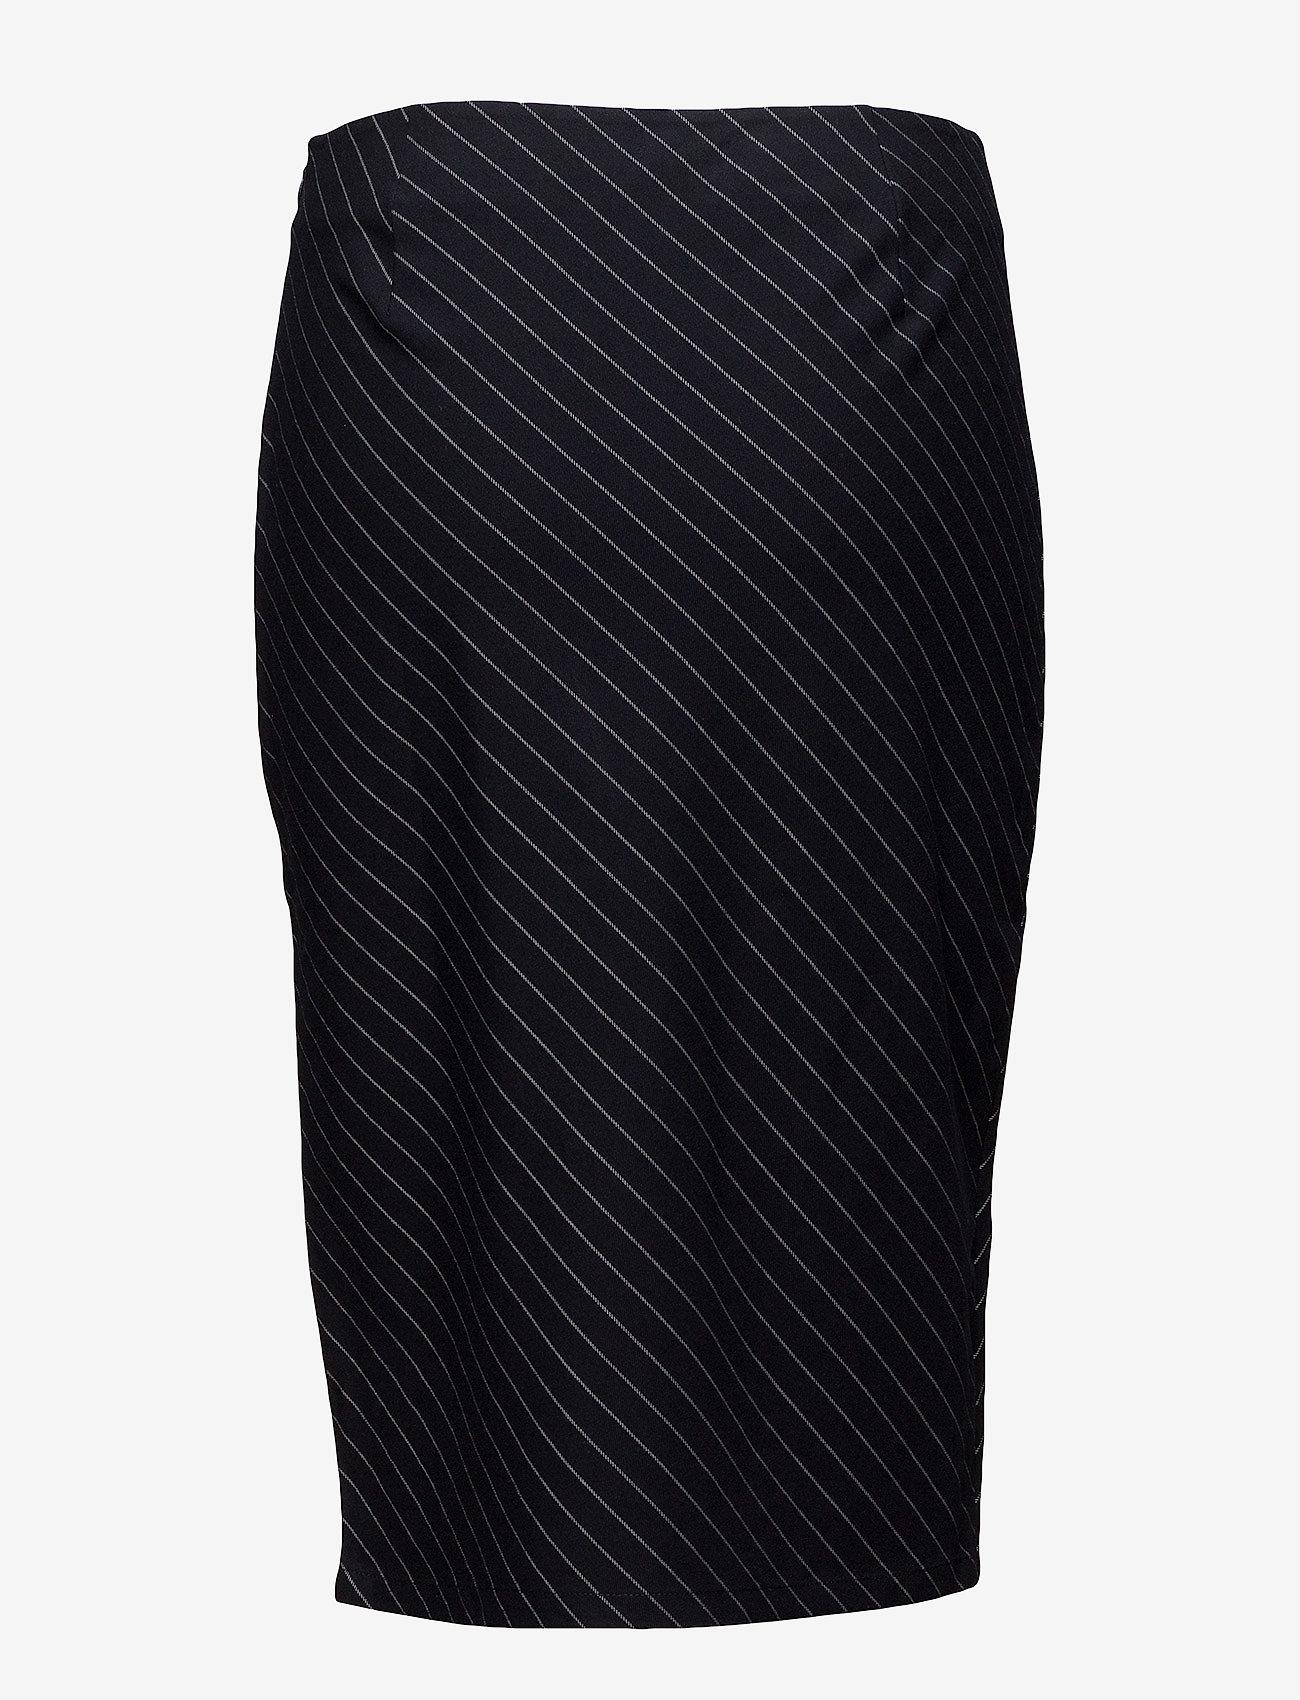 Twist & Tango Whitney Skirt - Skirts NAVY PIN STRIPE